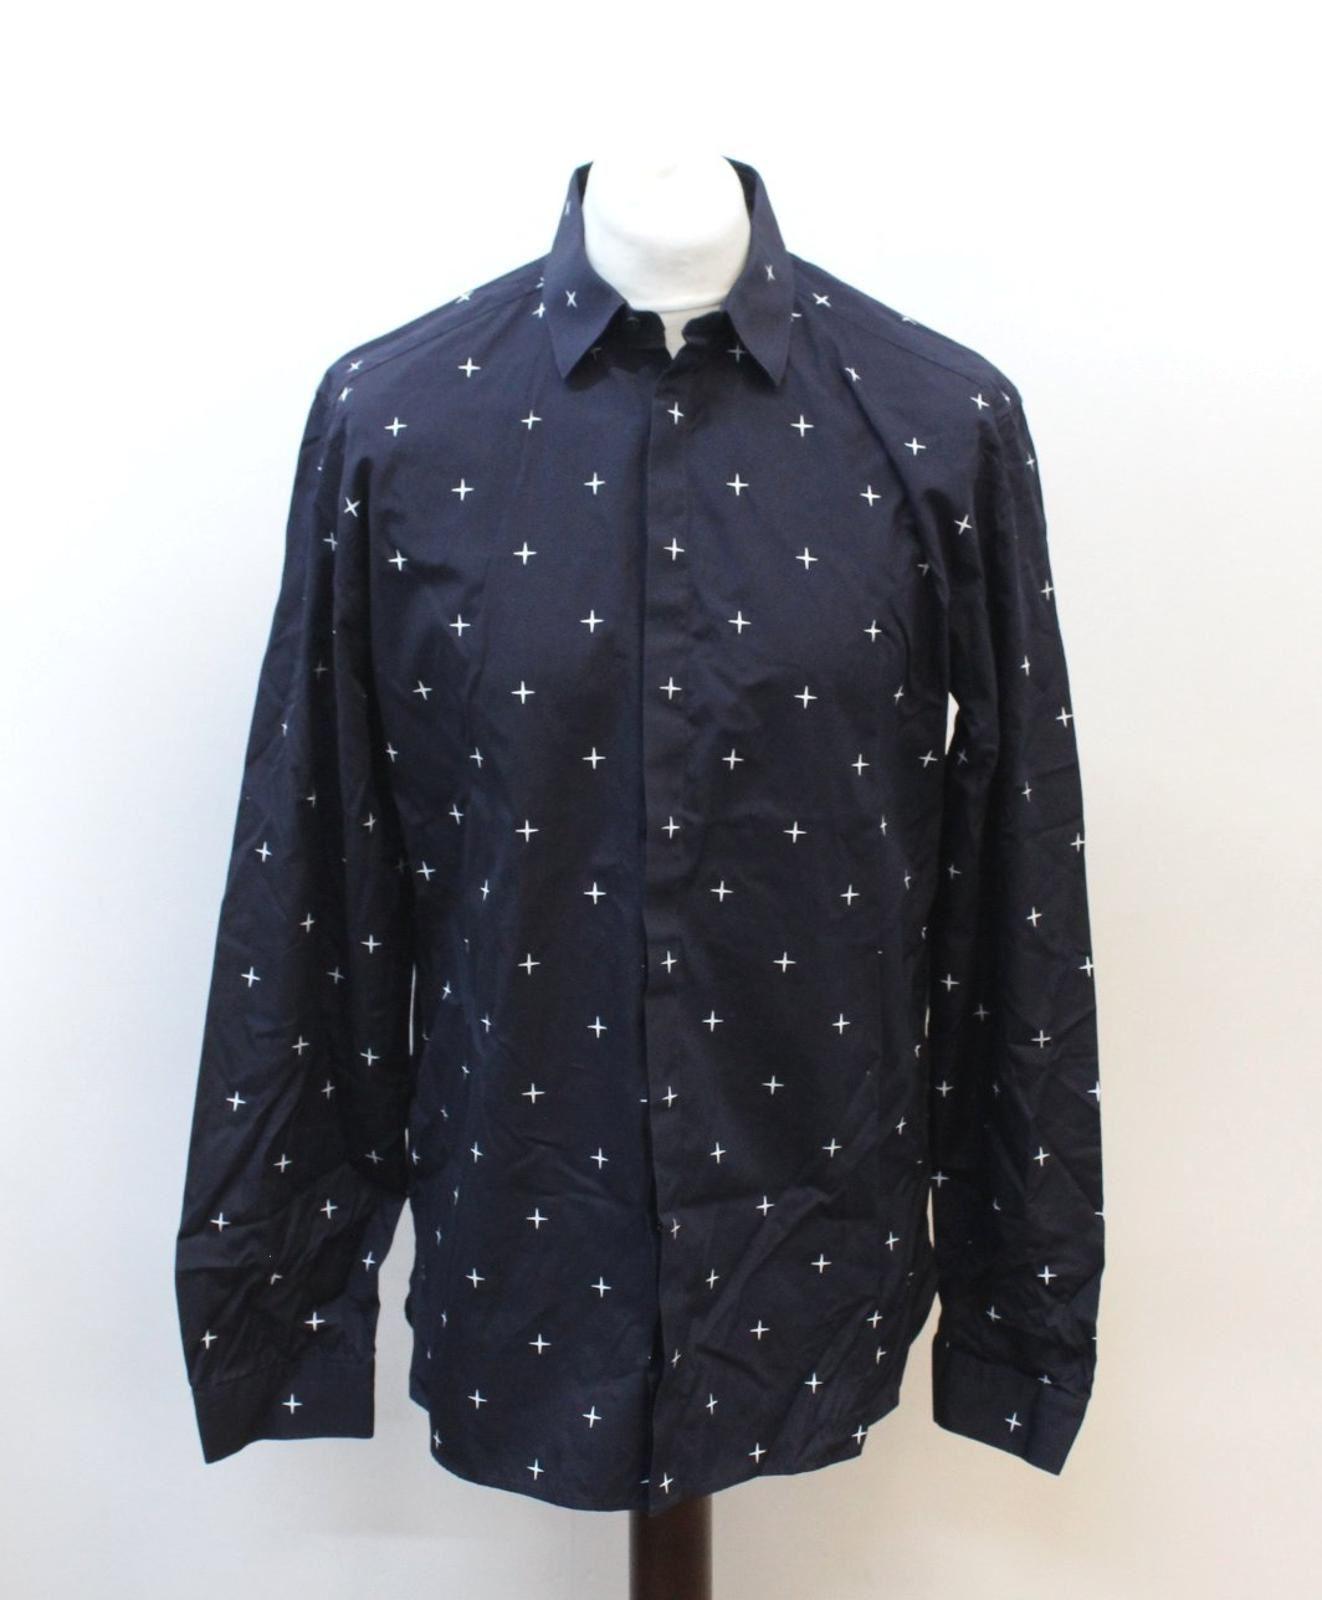 Neil-Barrett-Hombre-Azul-Marino-Blanco-Cuello-De-Camisa-formal-calce-Cruz-16-5-034-42cm